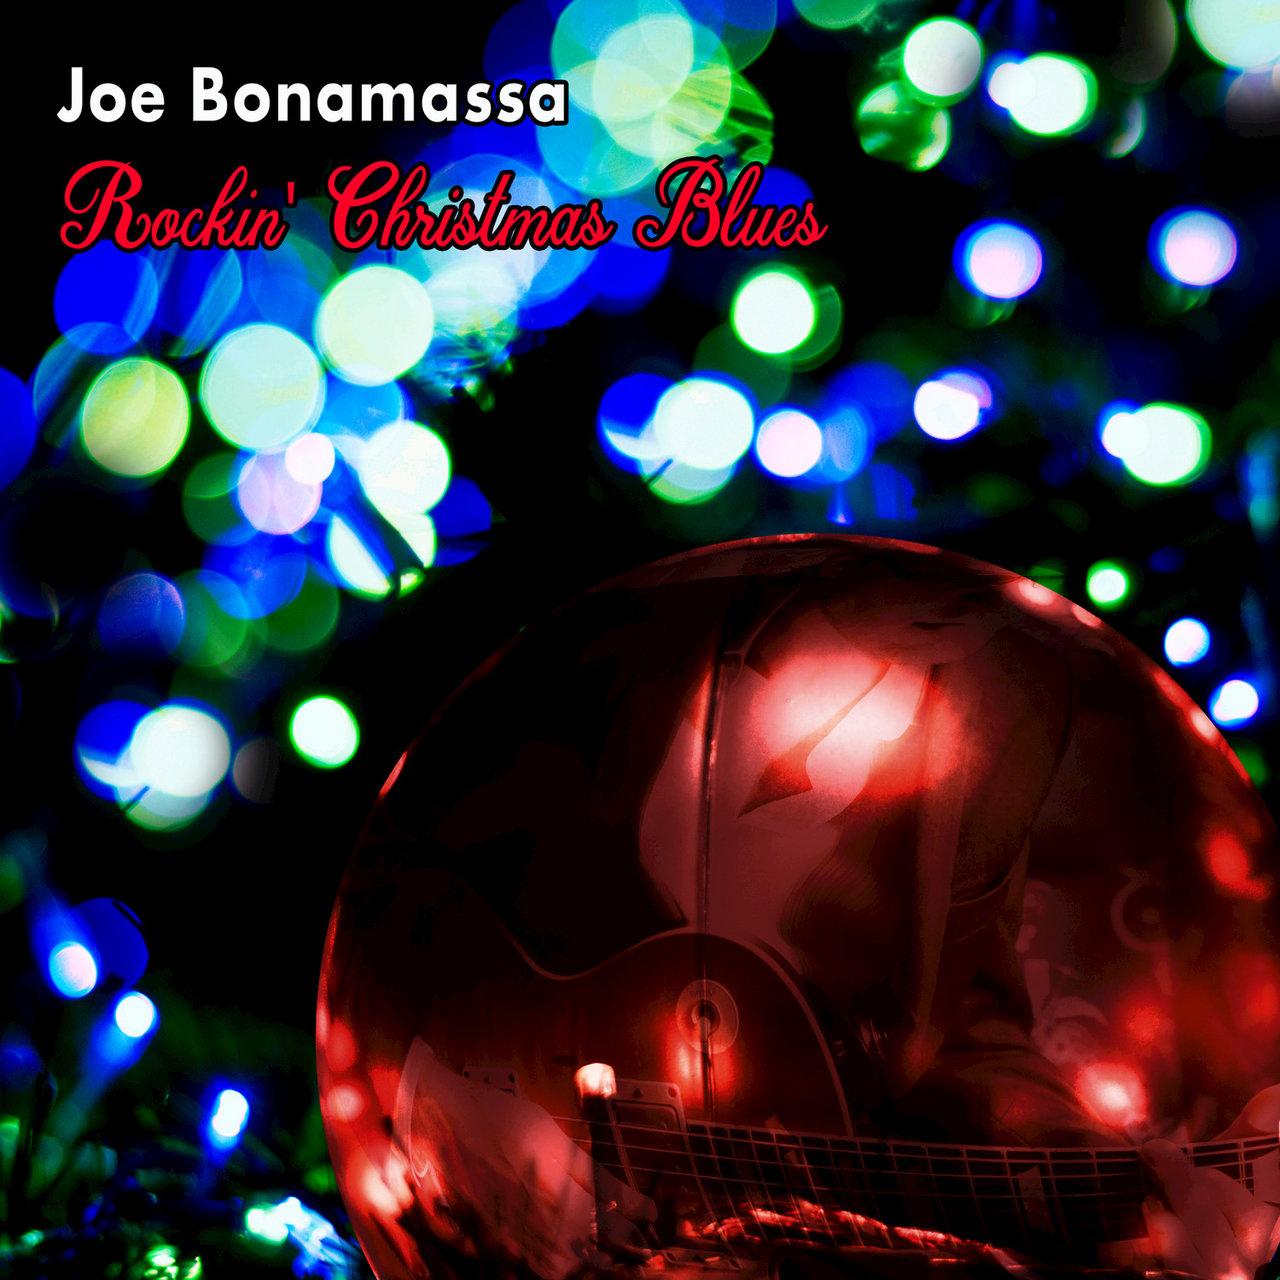 TIDAL: Listen to Joe Bonamassa on TIDAL